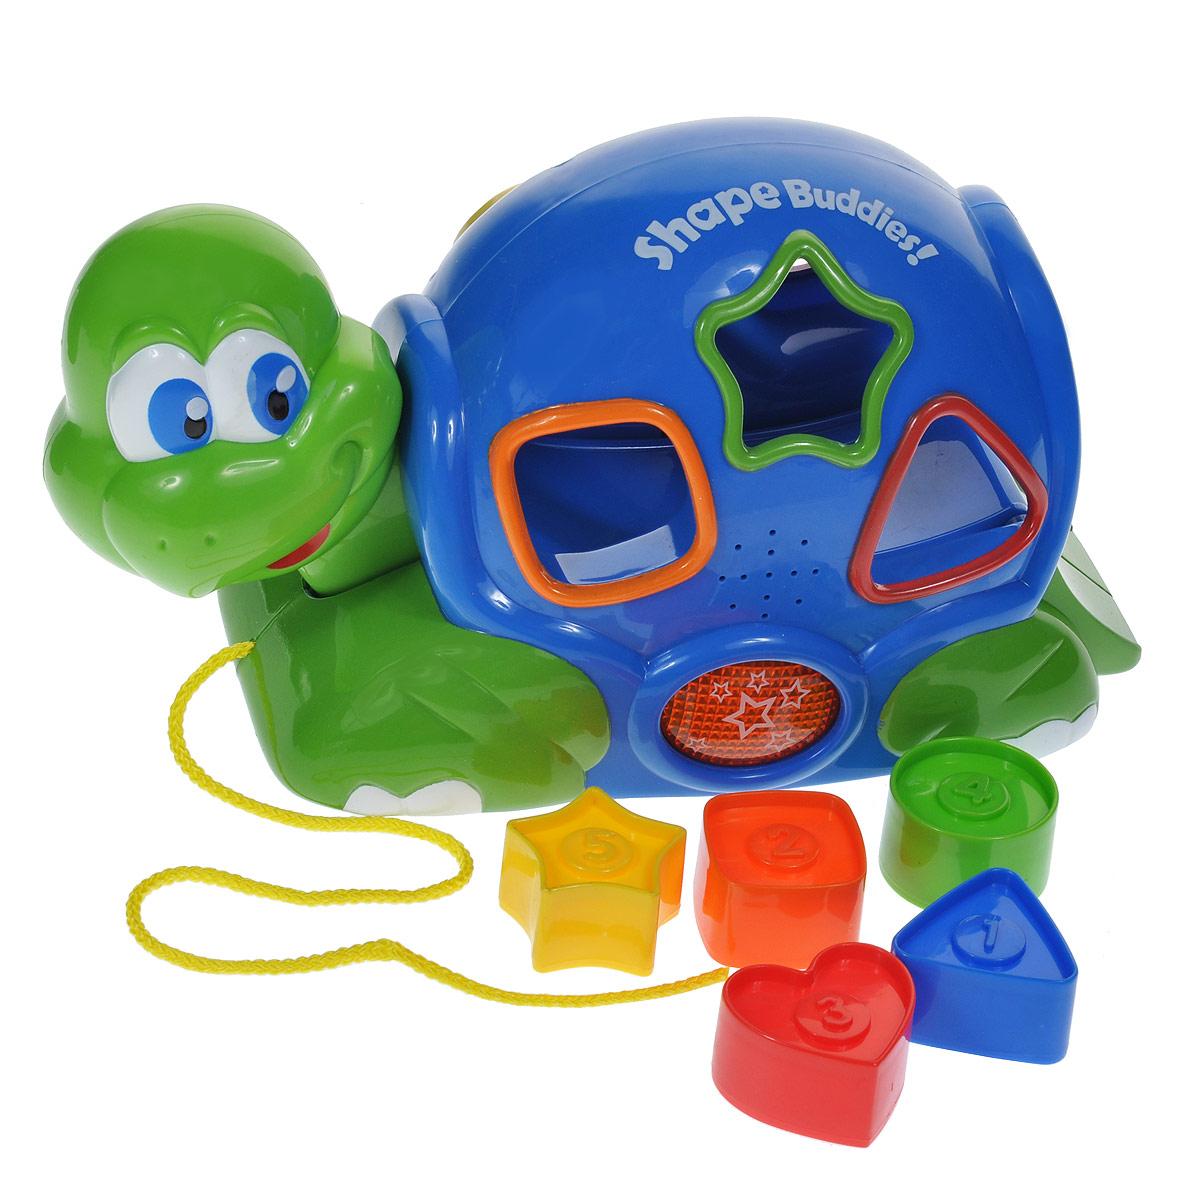 Игрушка-сортер Keenway Черепашка, 6 предметов развивающая игрушка keenway черепашка с пазлами звук свет фигурки